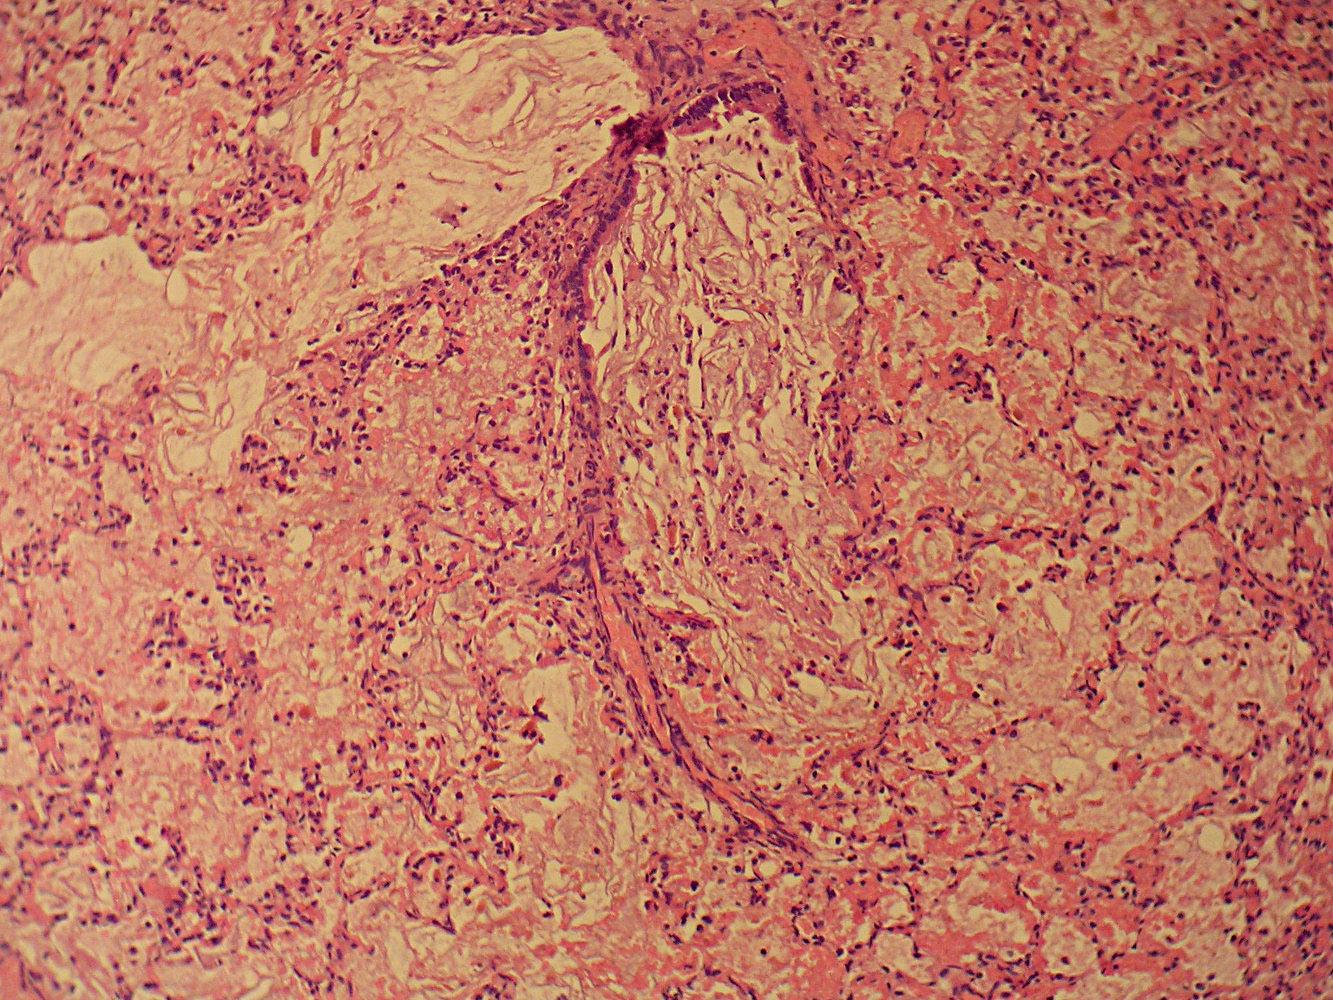 Amniotic fluid aspiration pneumonitis